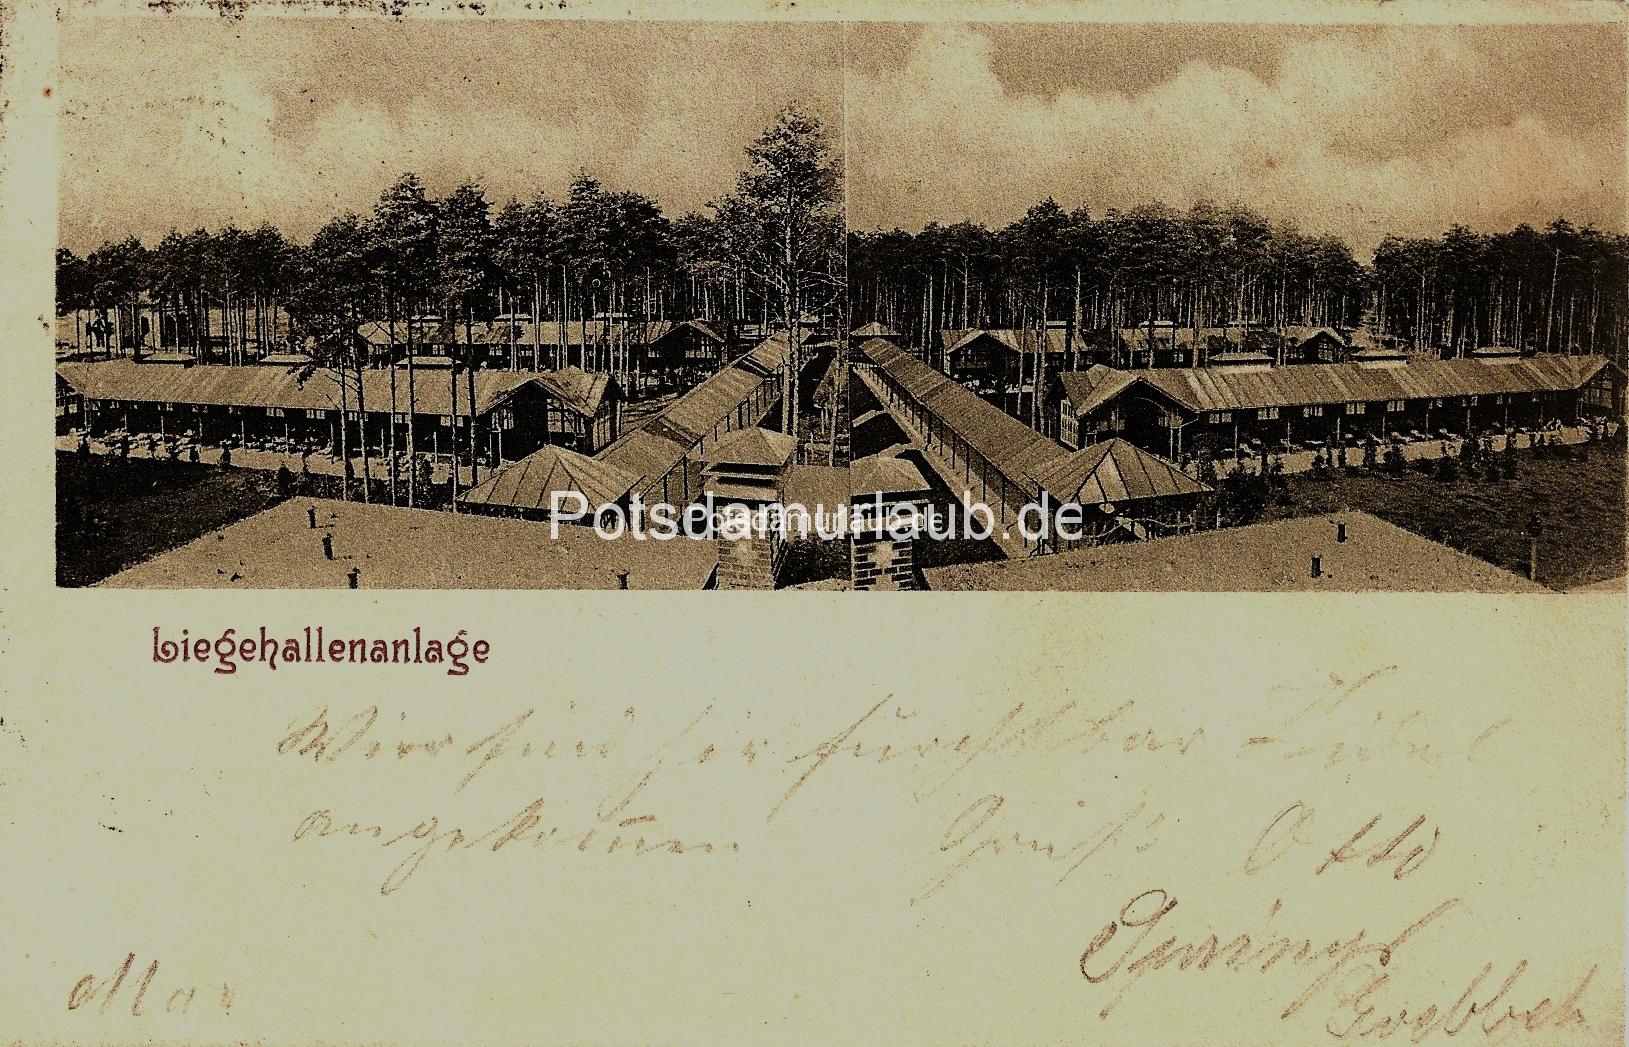 1904 03 21 v